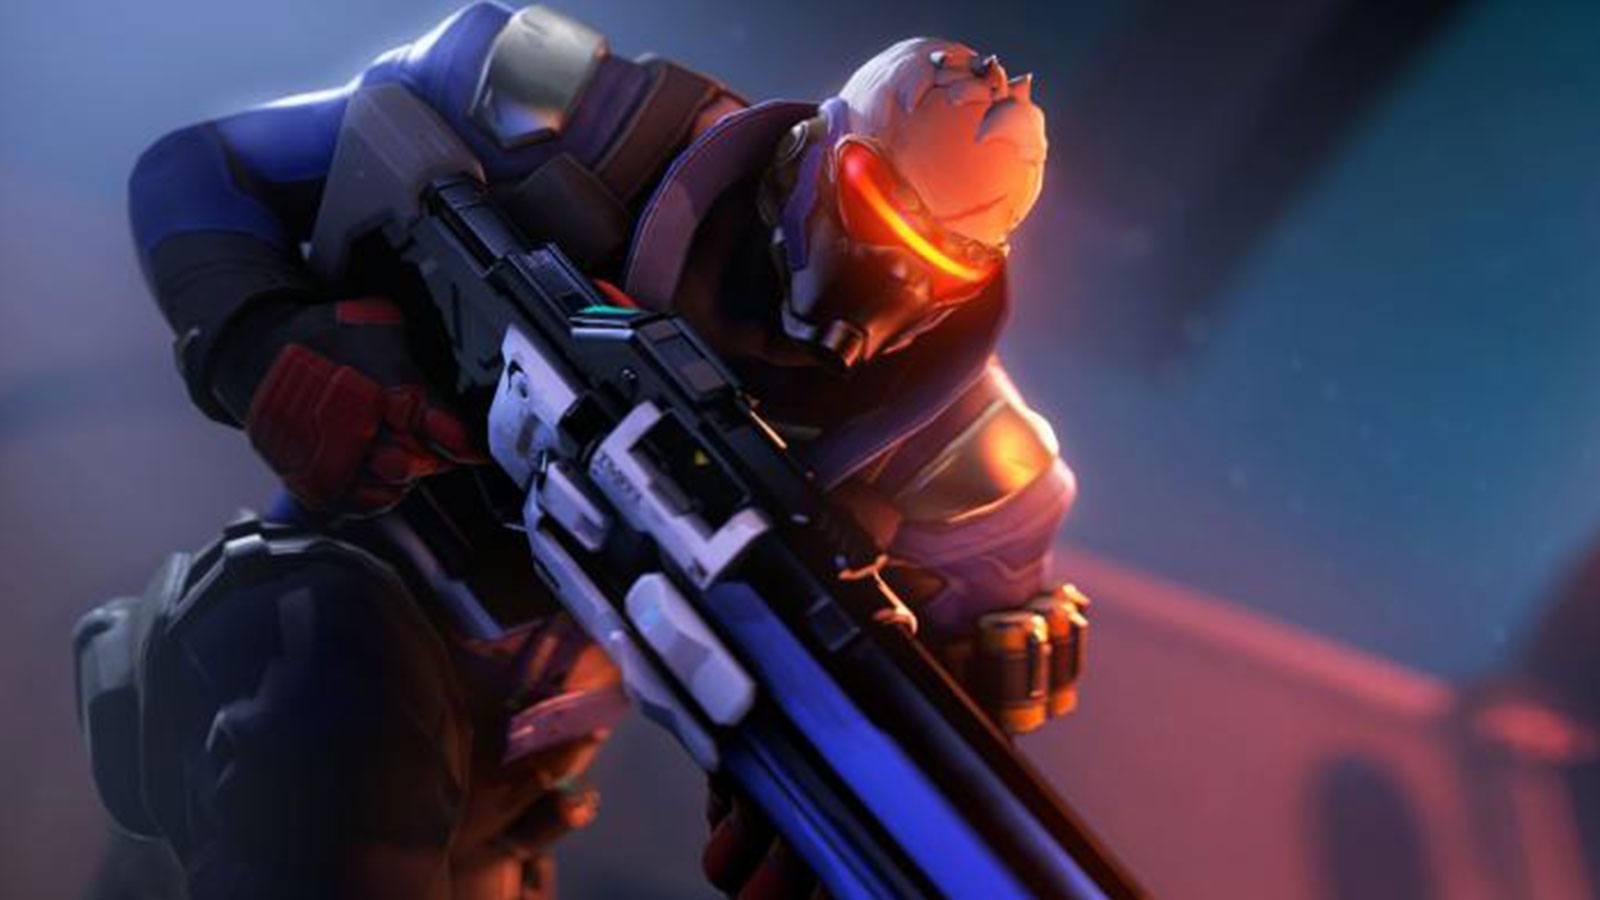 Soldat 76 Overwatch ultime Blizzard